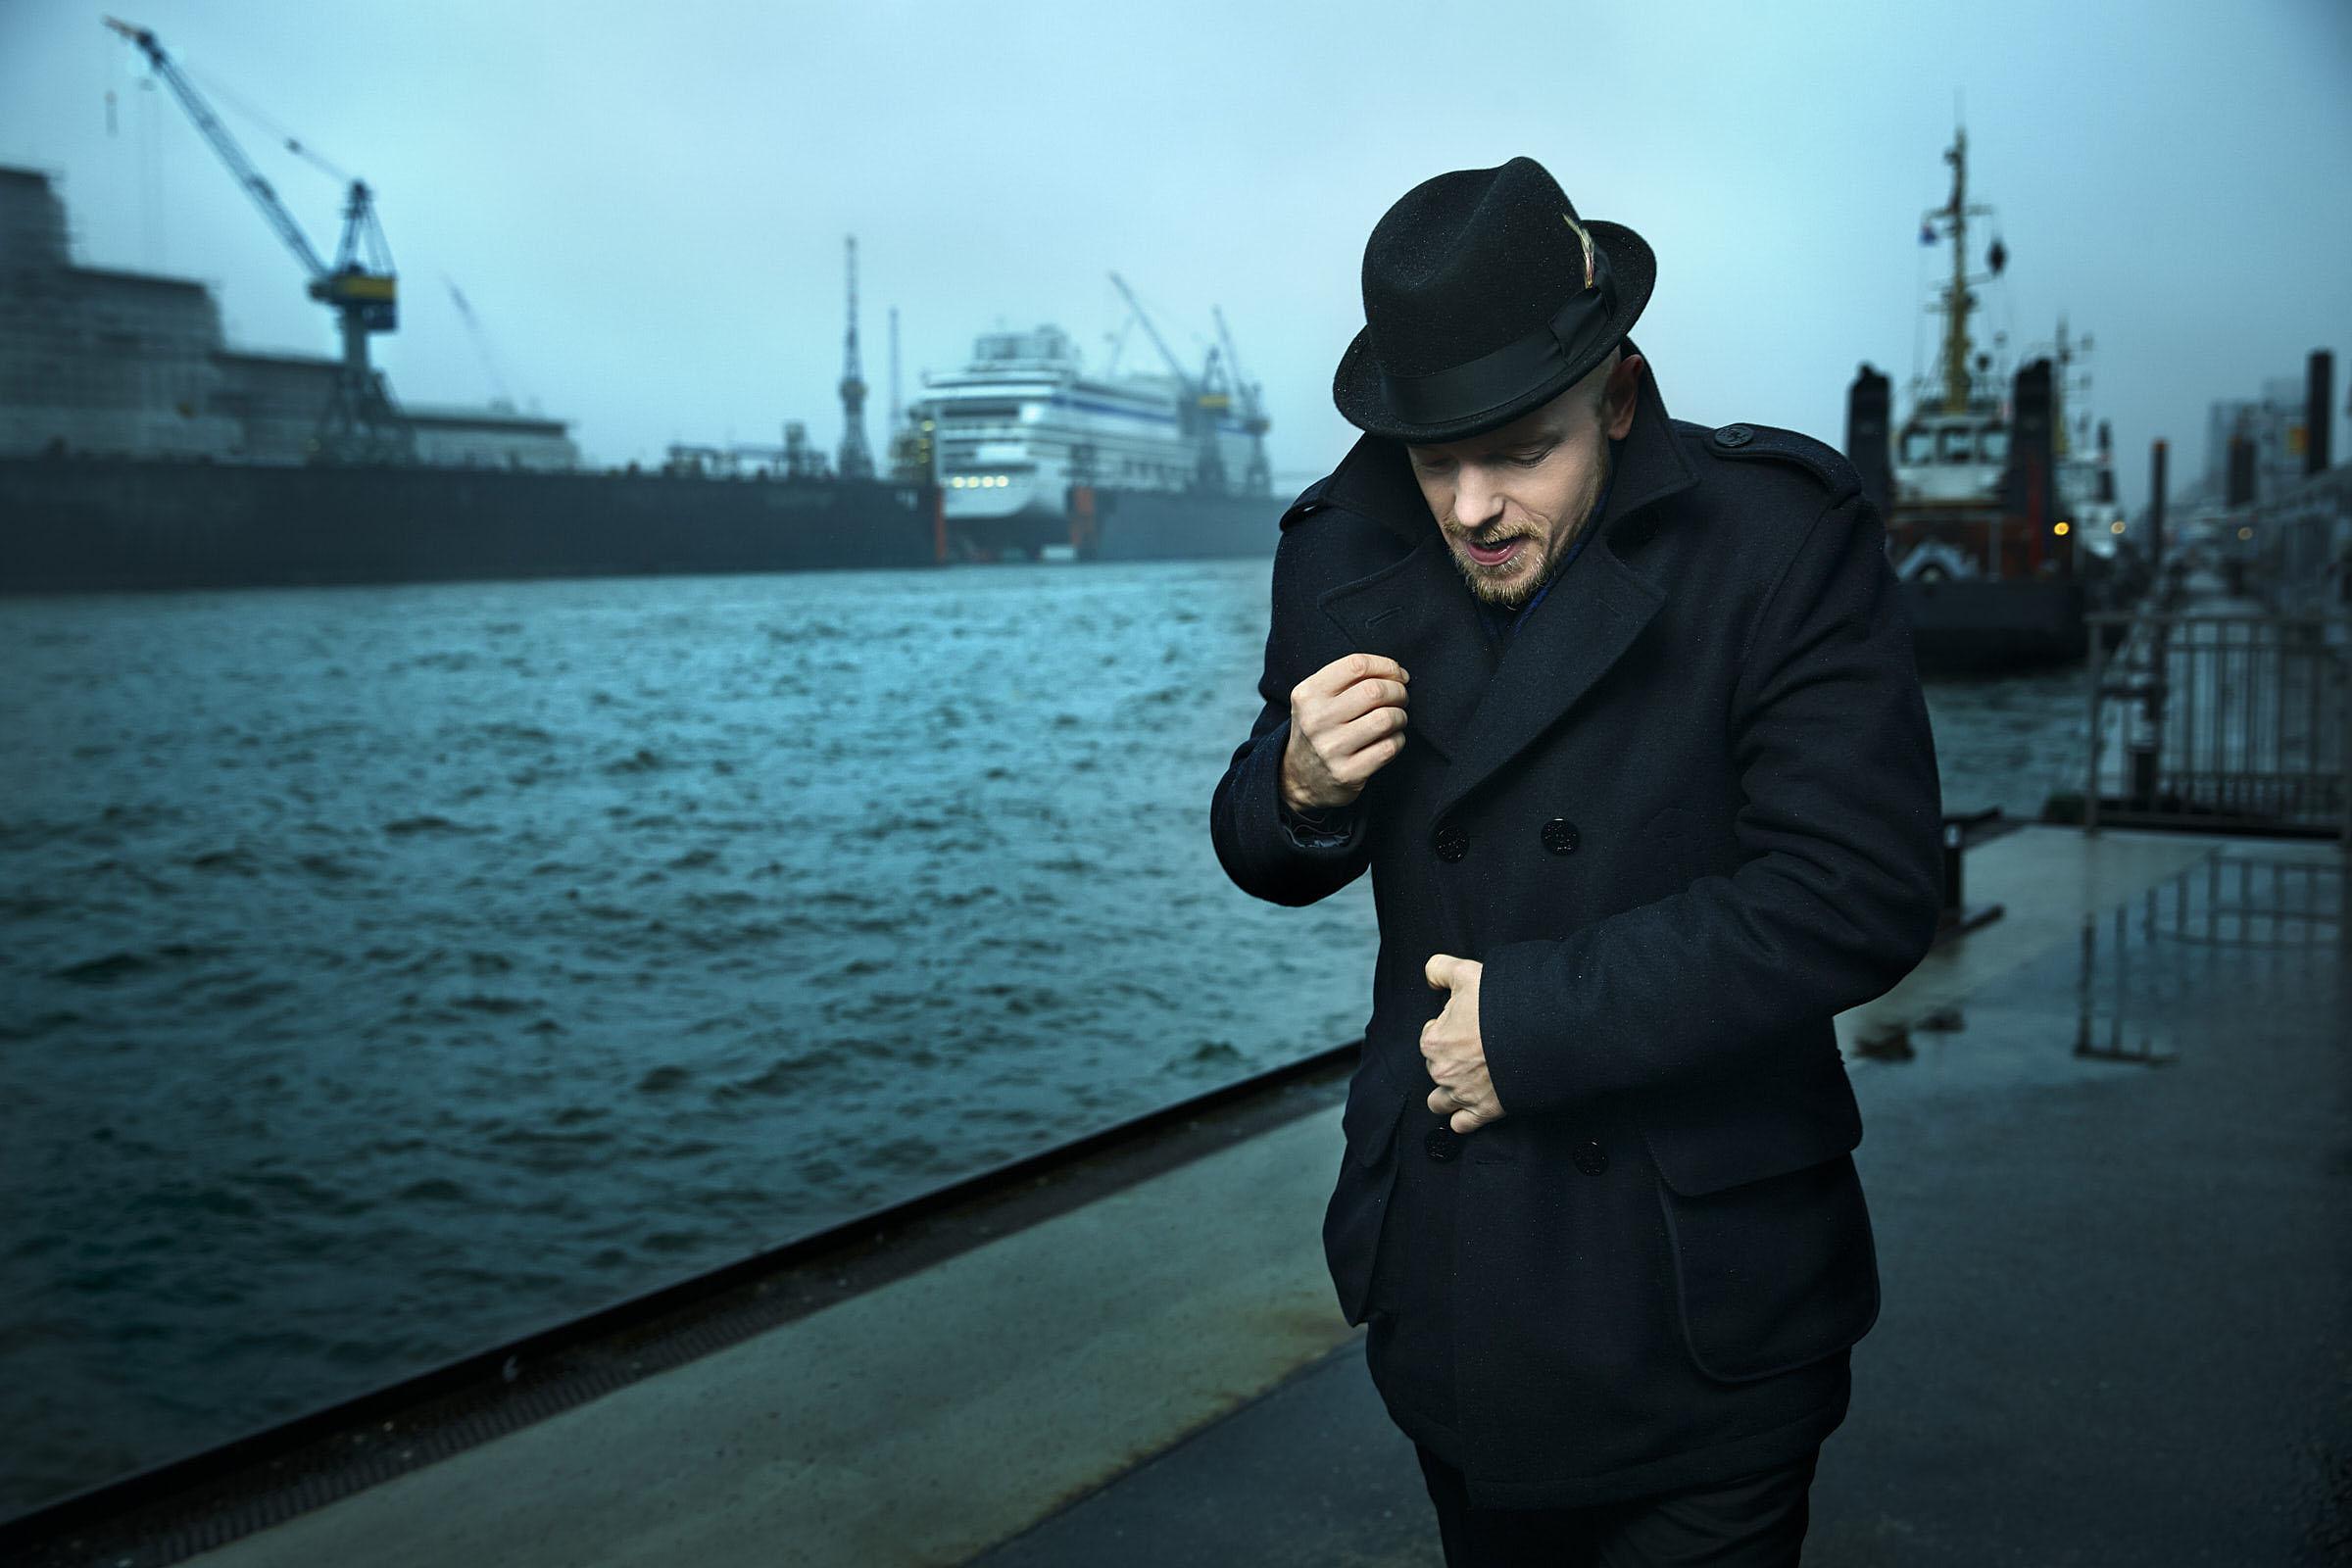 Jan Delay am 09.12.2013 an den Landungsbrücken im Hamburger Hafen